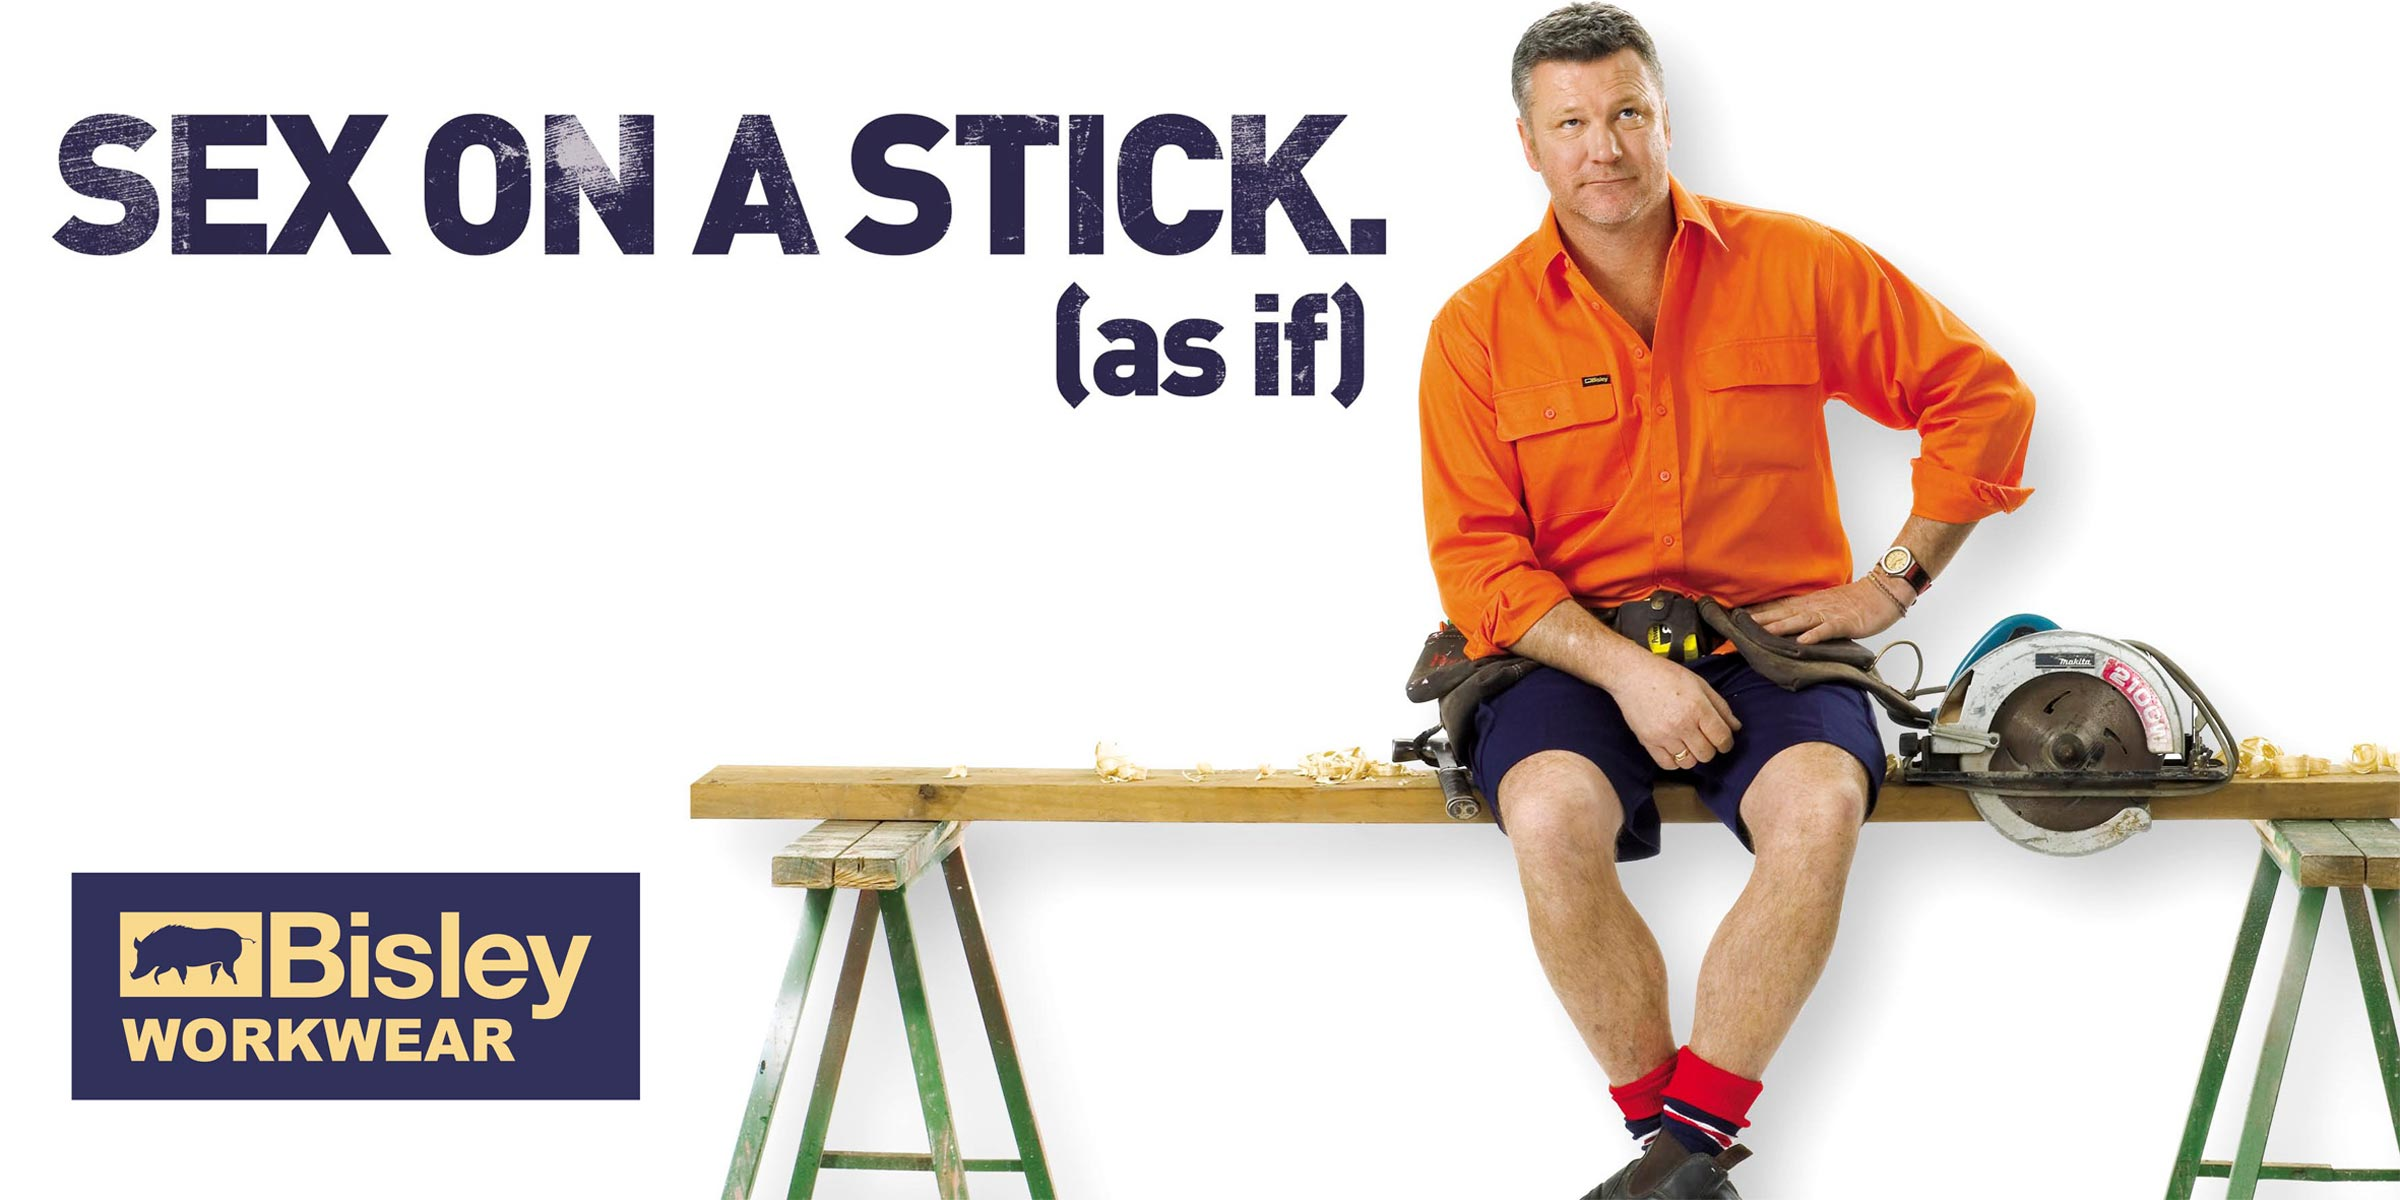 workman sitting on plank of wood on trestles